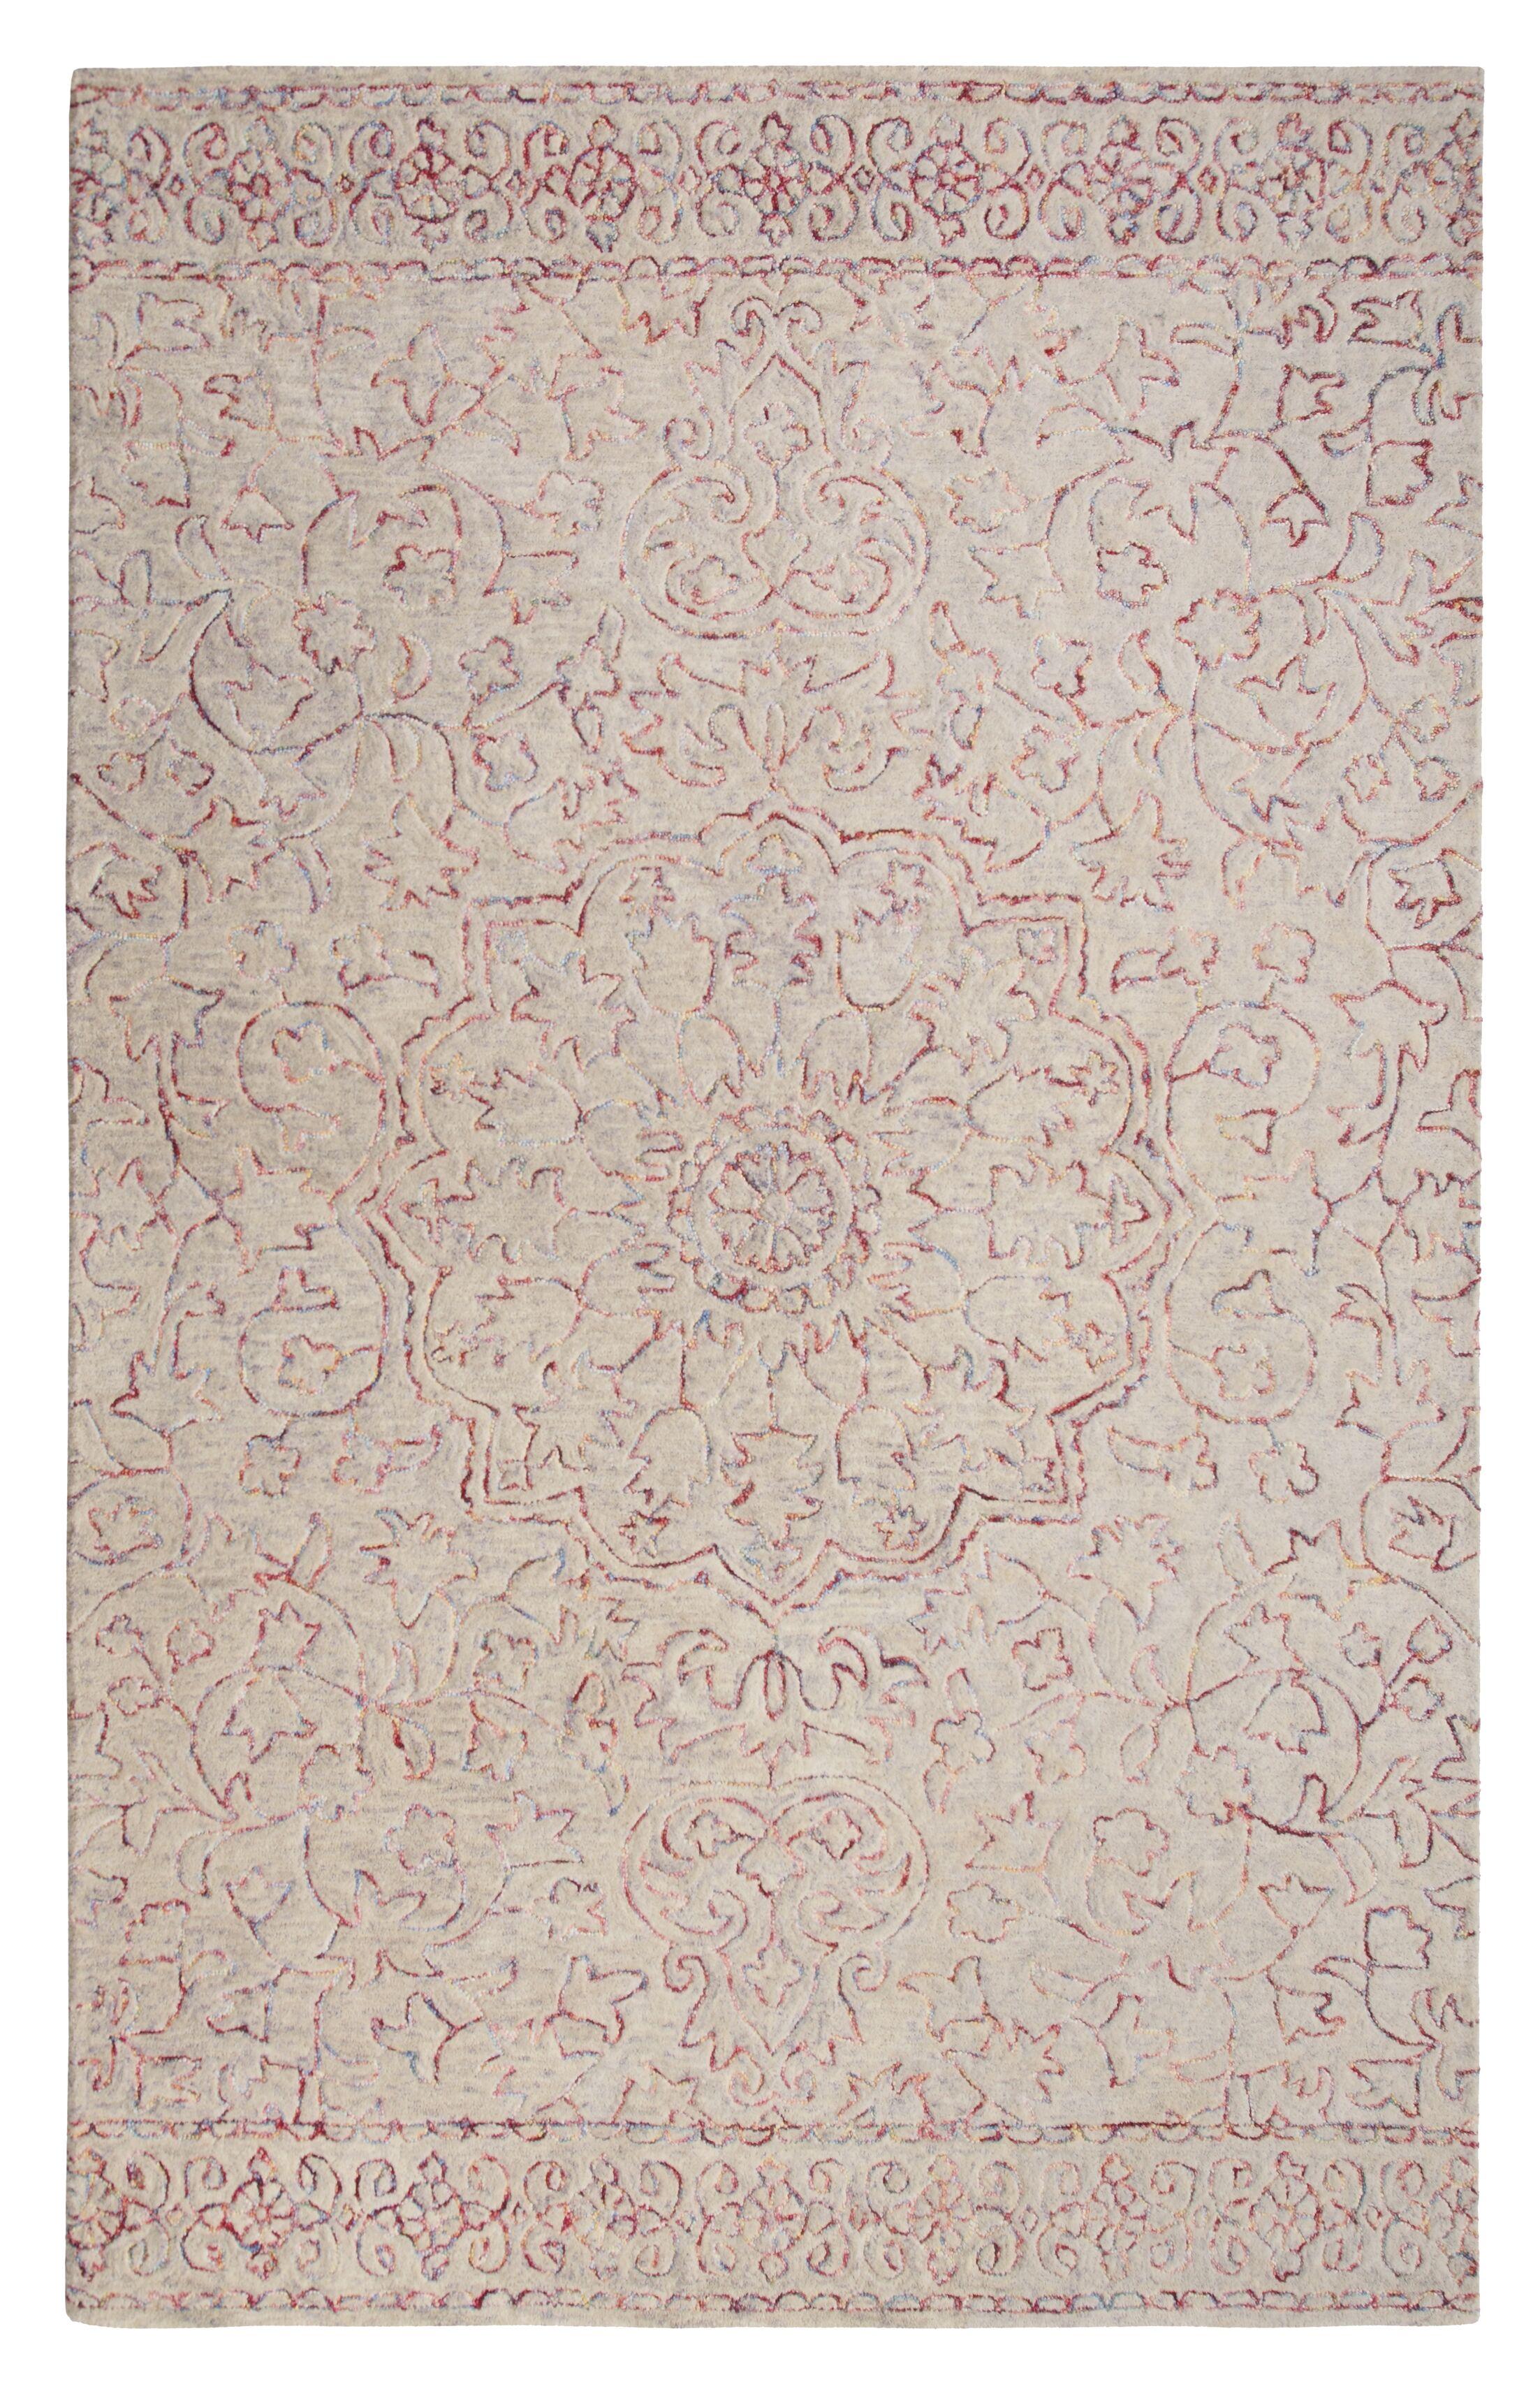 Gosnold Wheat/Carmine Area Rug Rug Size: Rectangle 7'6